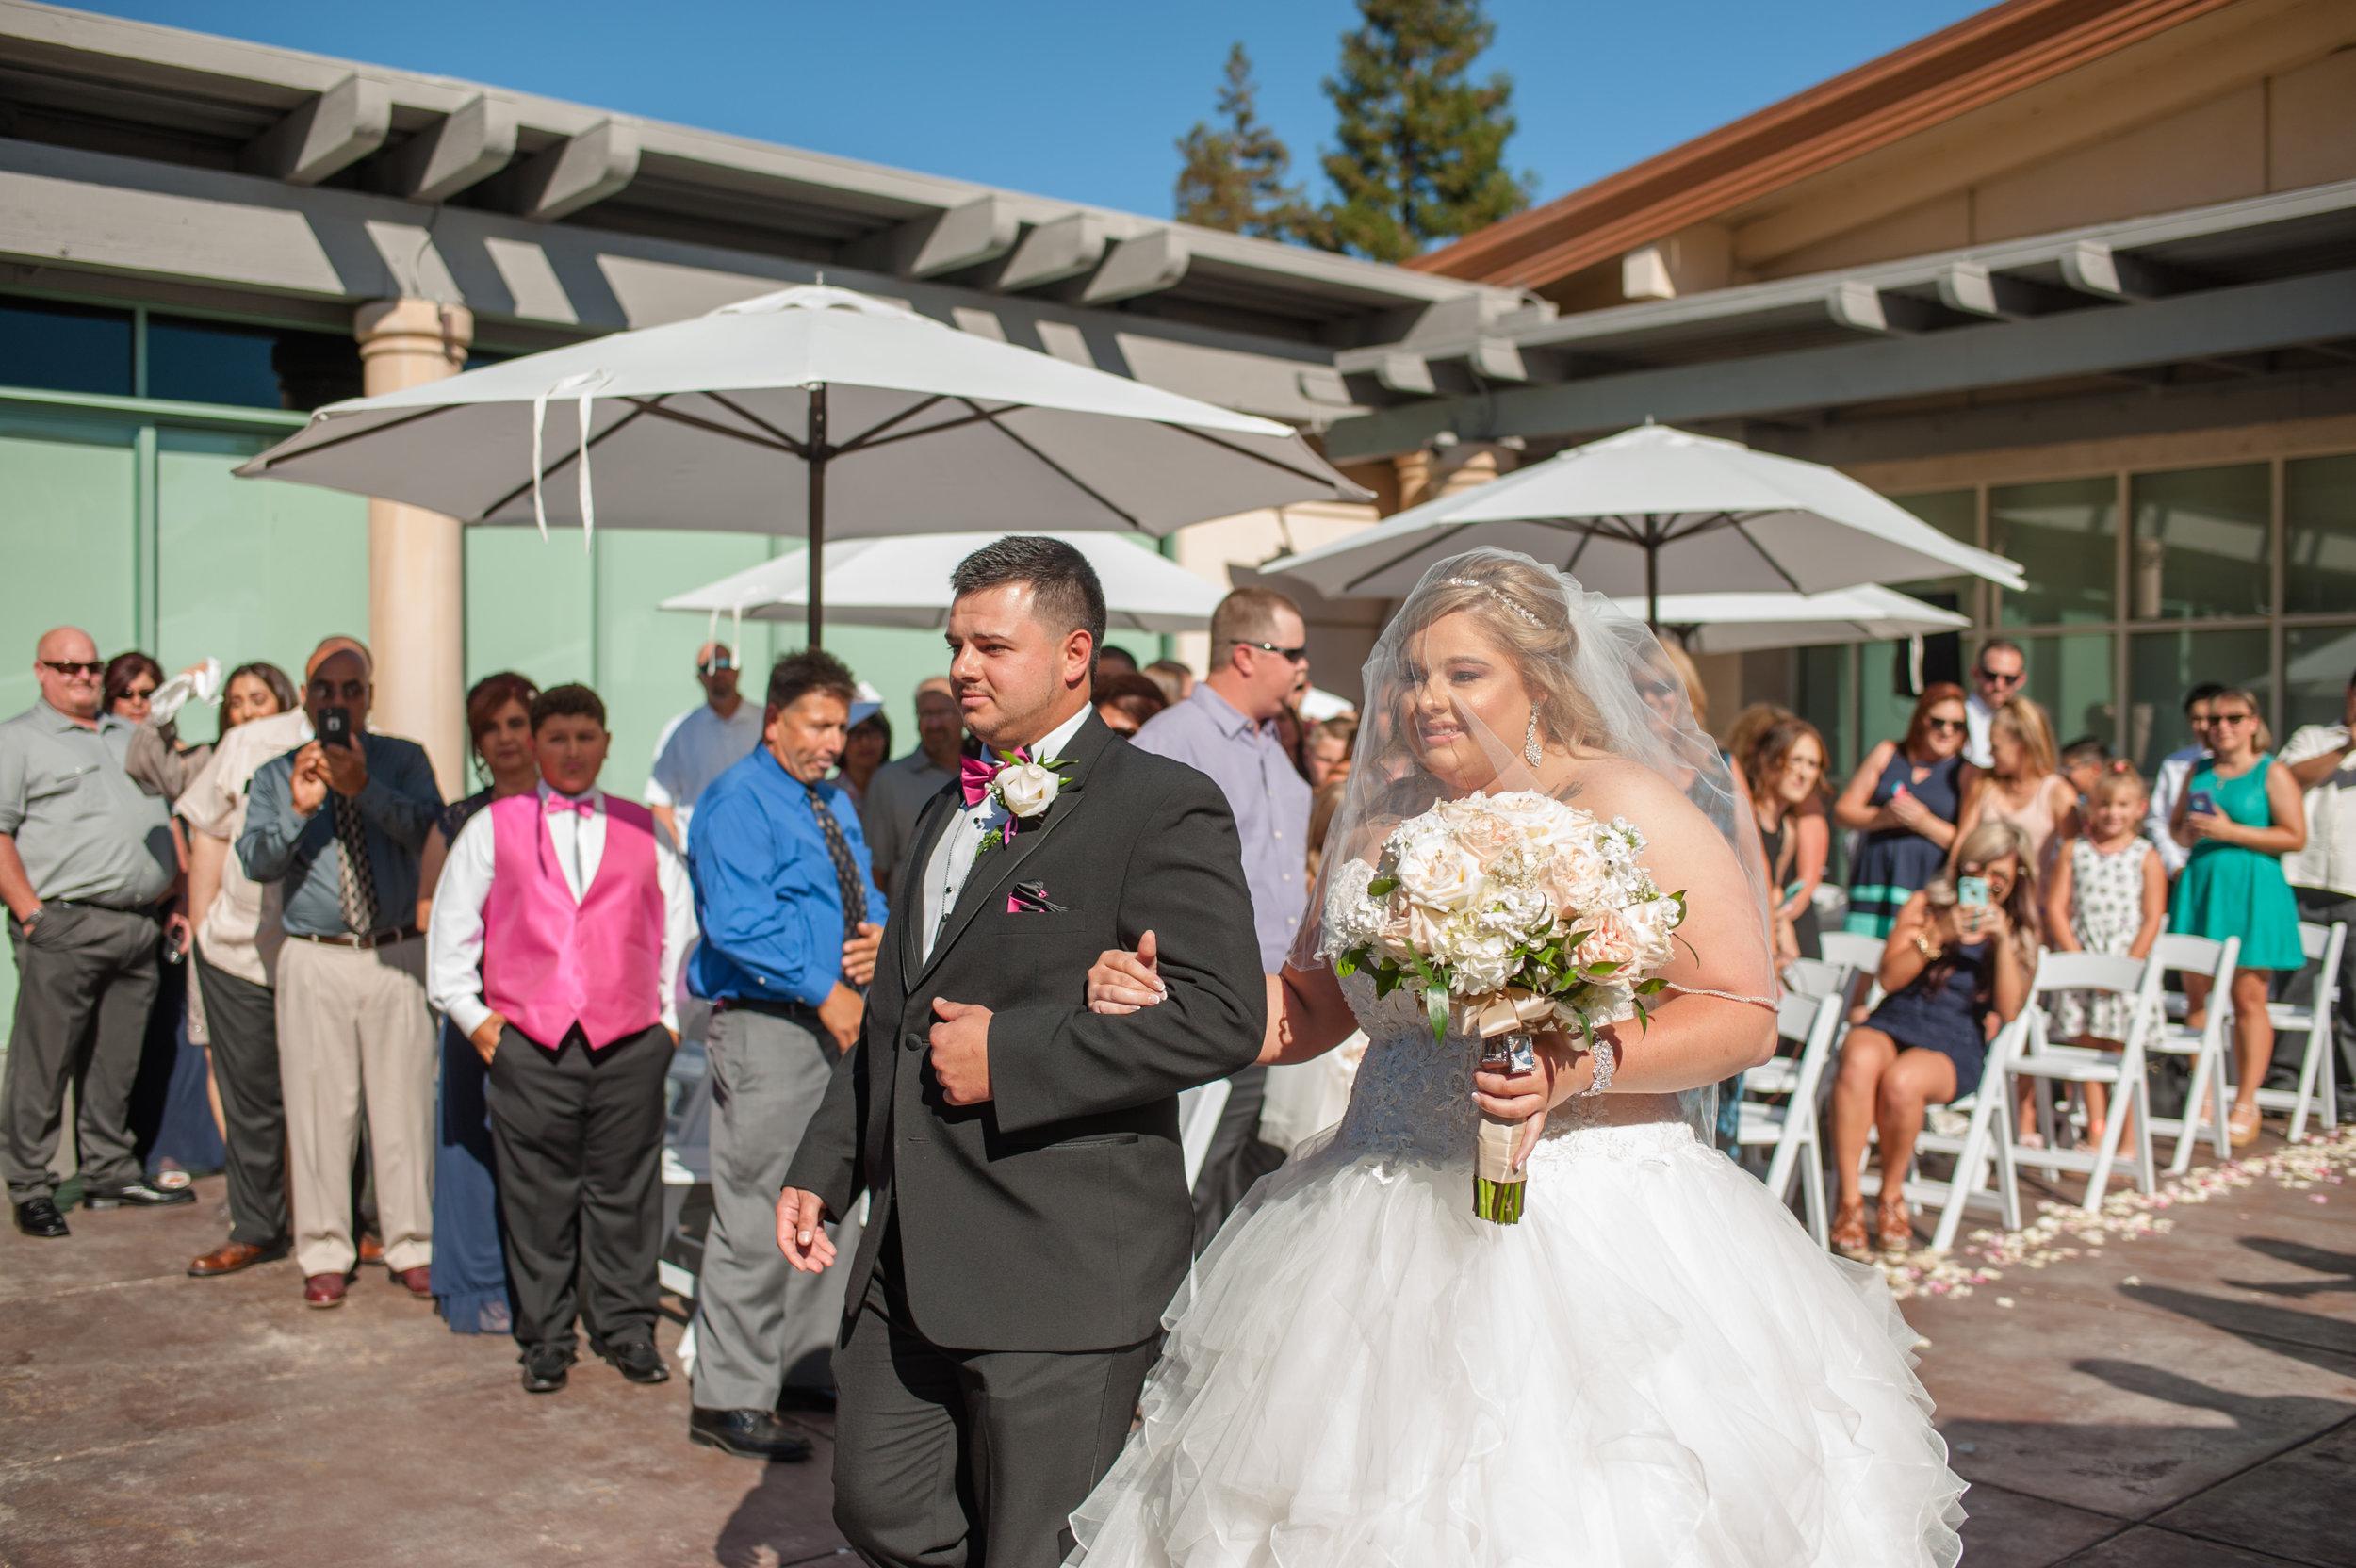 lyndzie-javier-013-arden-hills-sacramento-wedding-photographer-katherine-nicole-photography.JPG